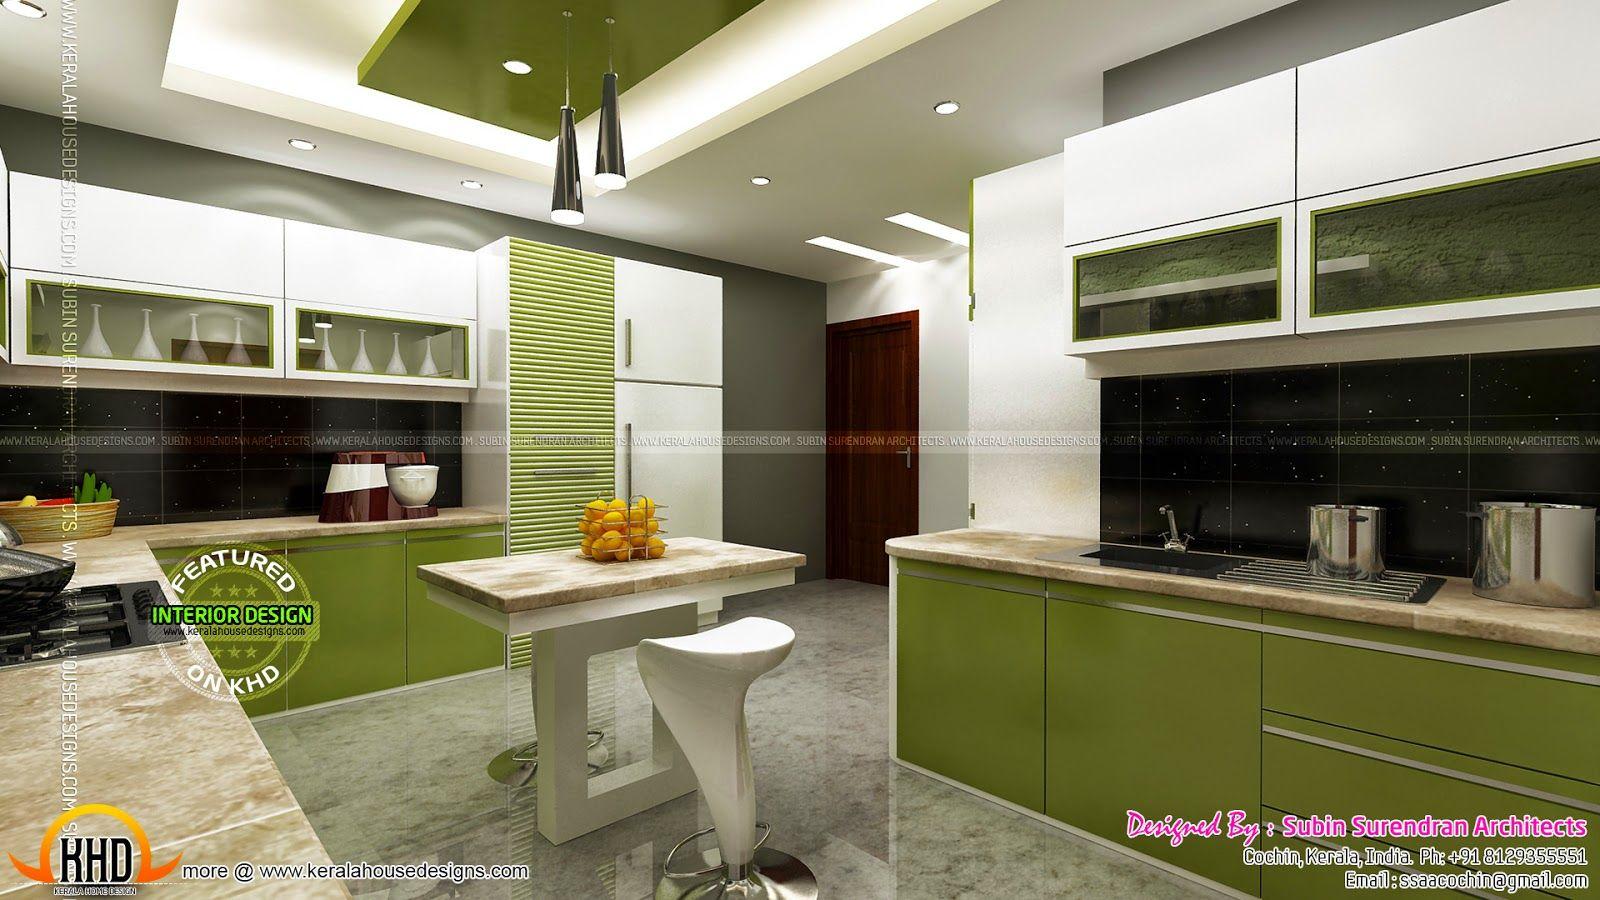 Luxury Interior Designs Kerala Kerala Home Design Floor Plans Kitchen  Interior Views Ss Architects Cochin Home